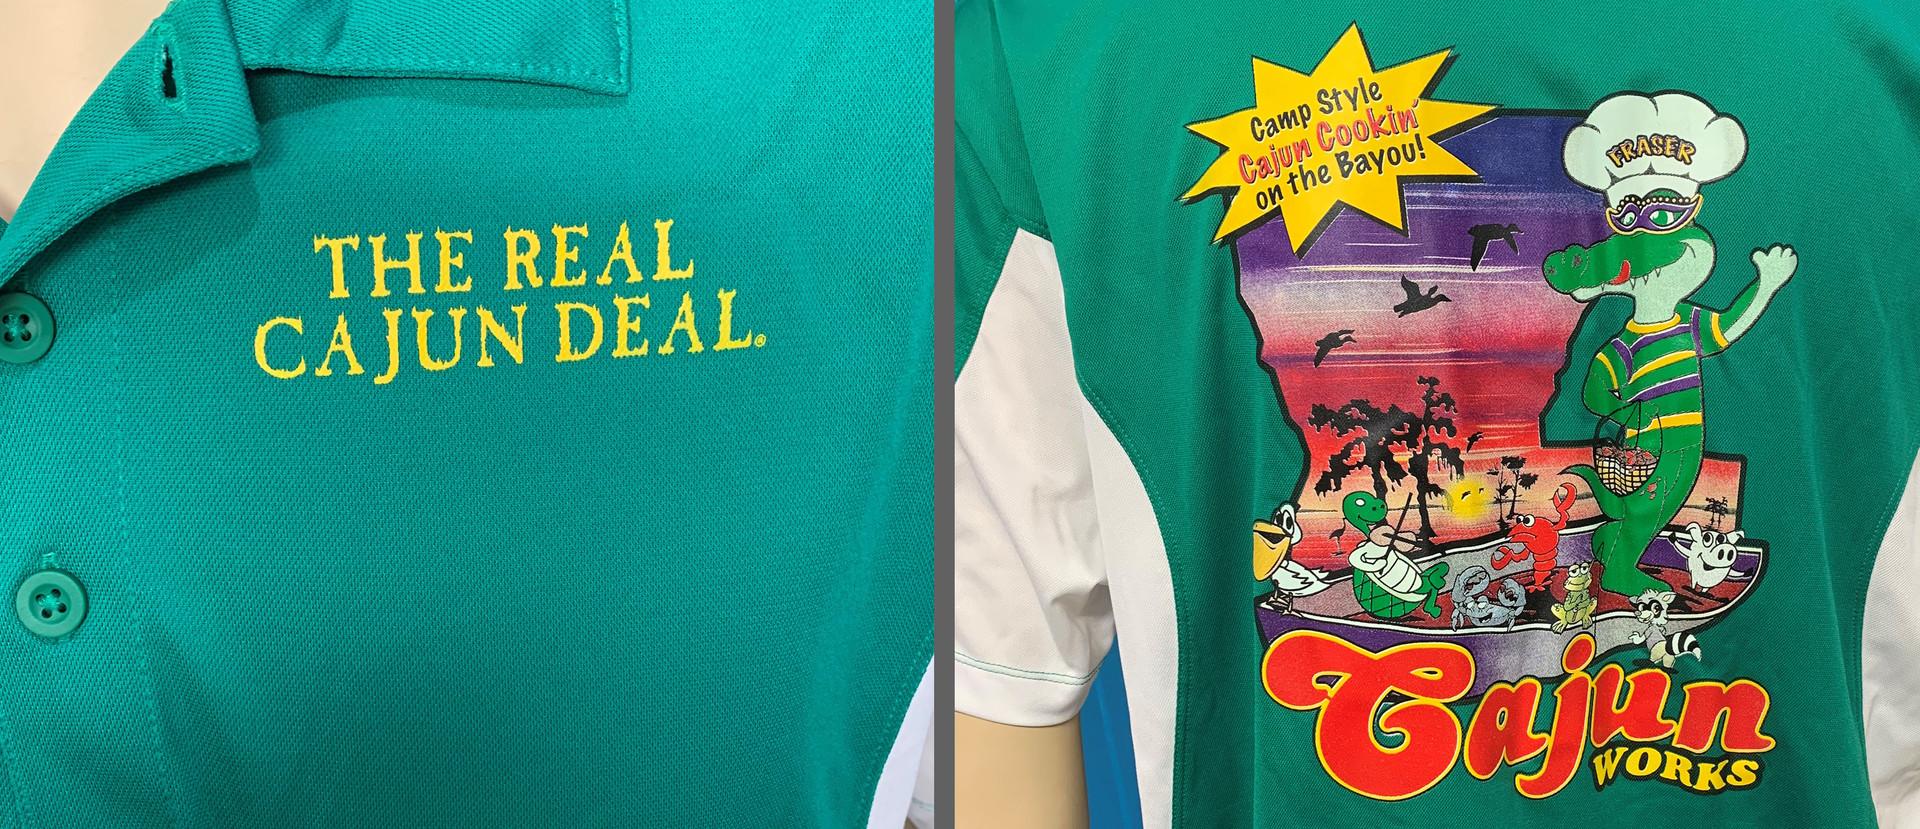 The Real Cajun Deal-2.JPG